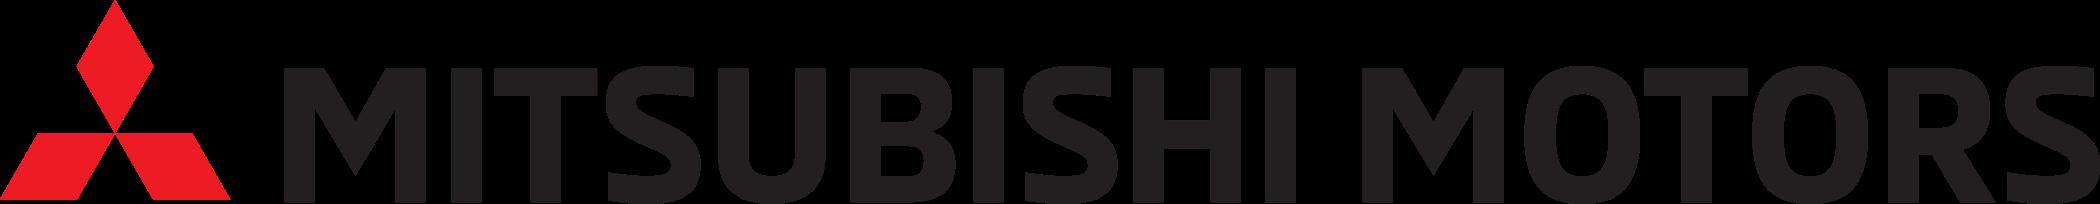 mitsubish logo 3 - Mitsubishi Logo – Mitsubishi Motors Logo